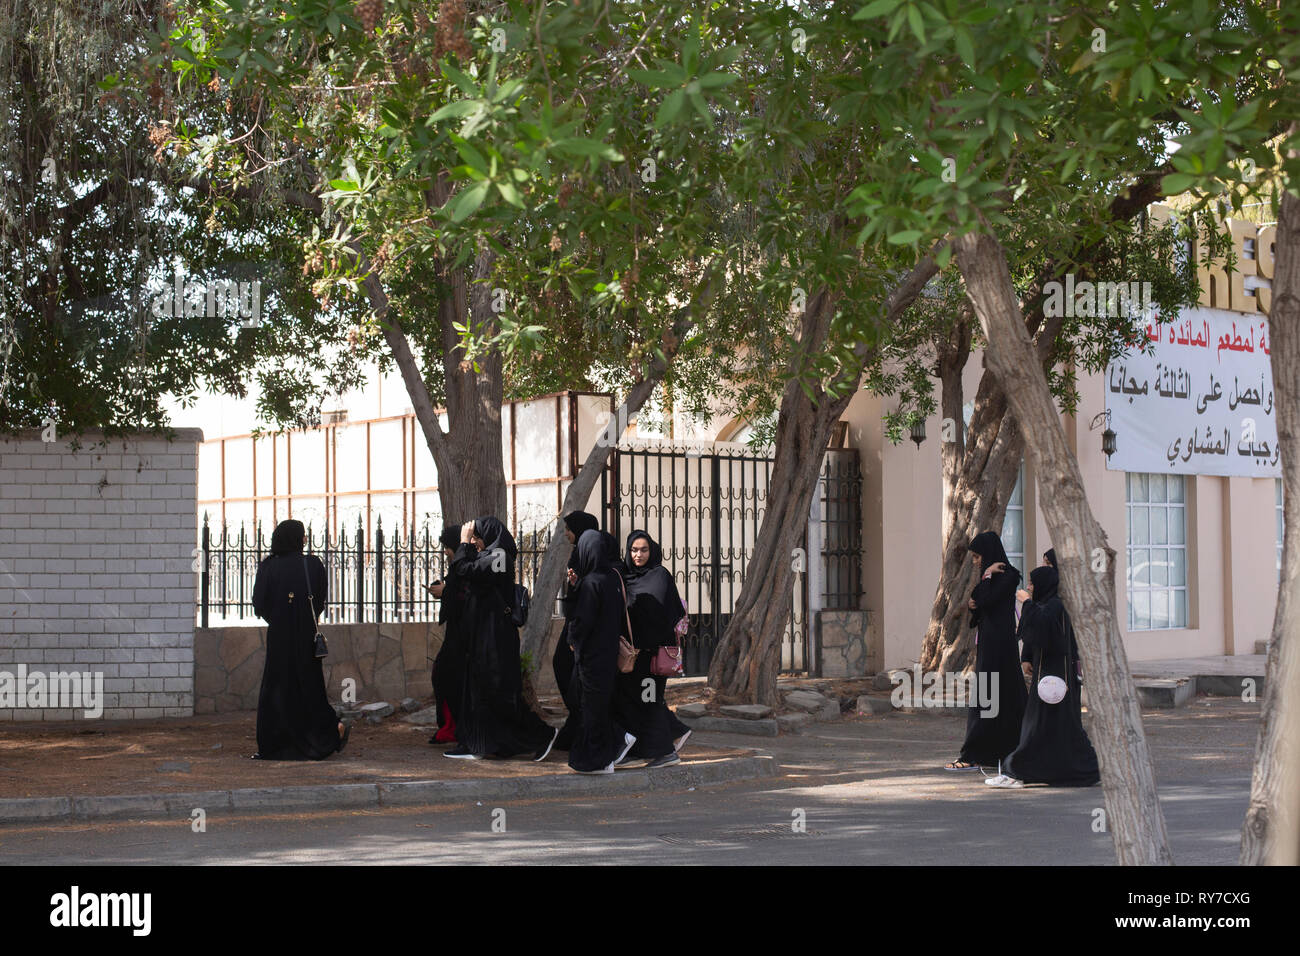 Oman Women Veil Stock Photos & Oman Women Veil Stock Images